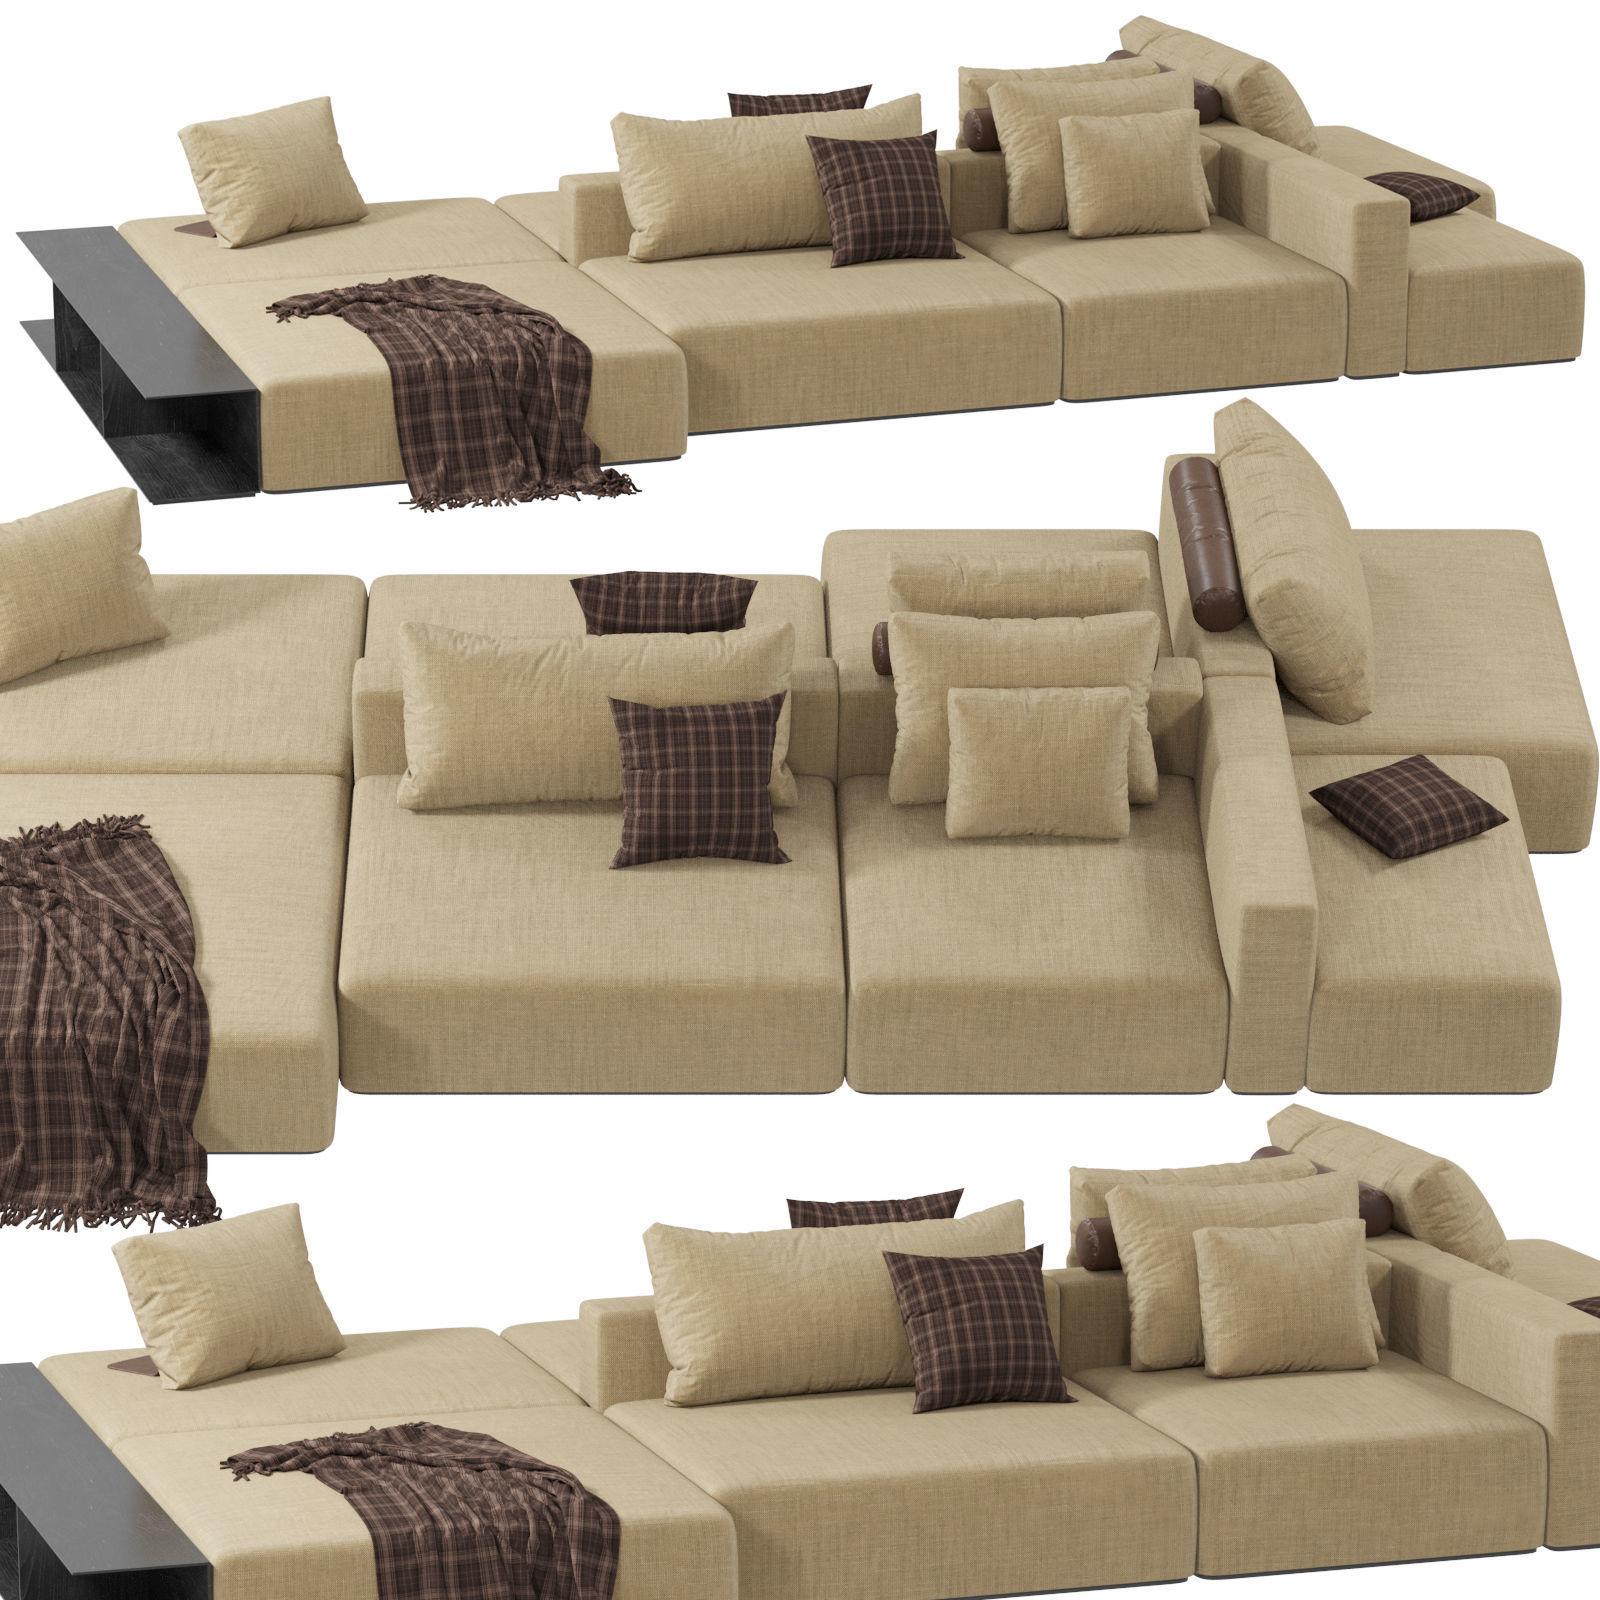 Divani Poliform.Poliform Westside Divano Sofa 3d Model